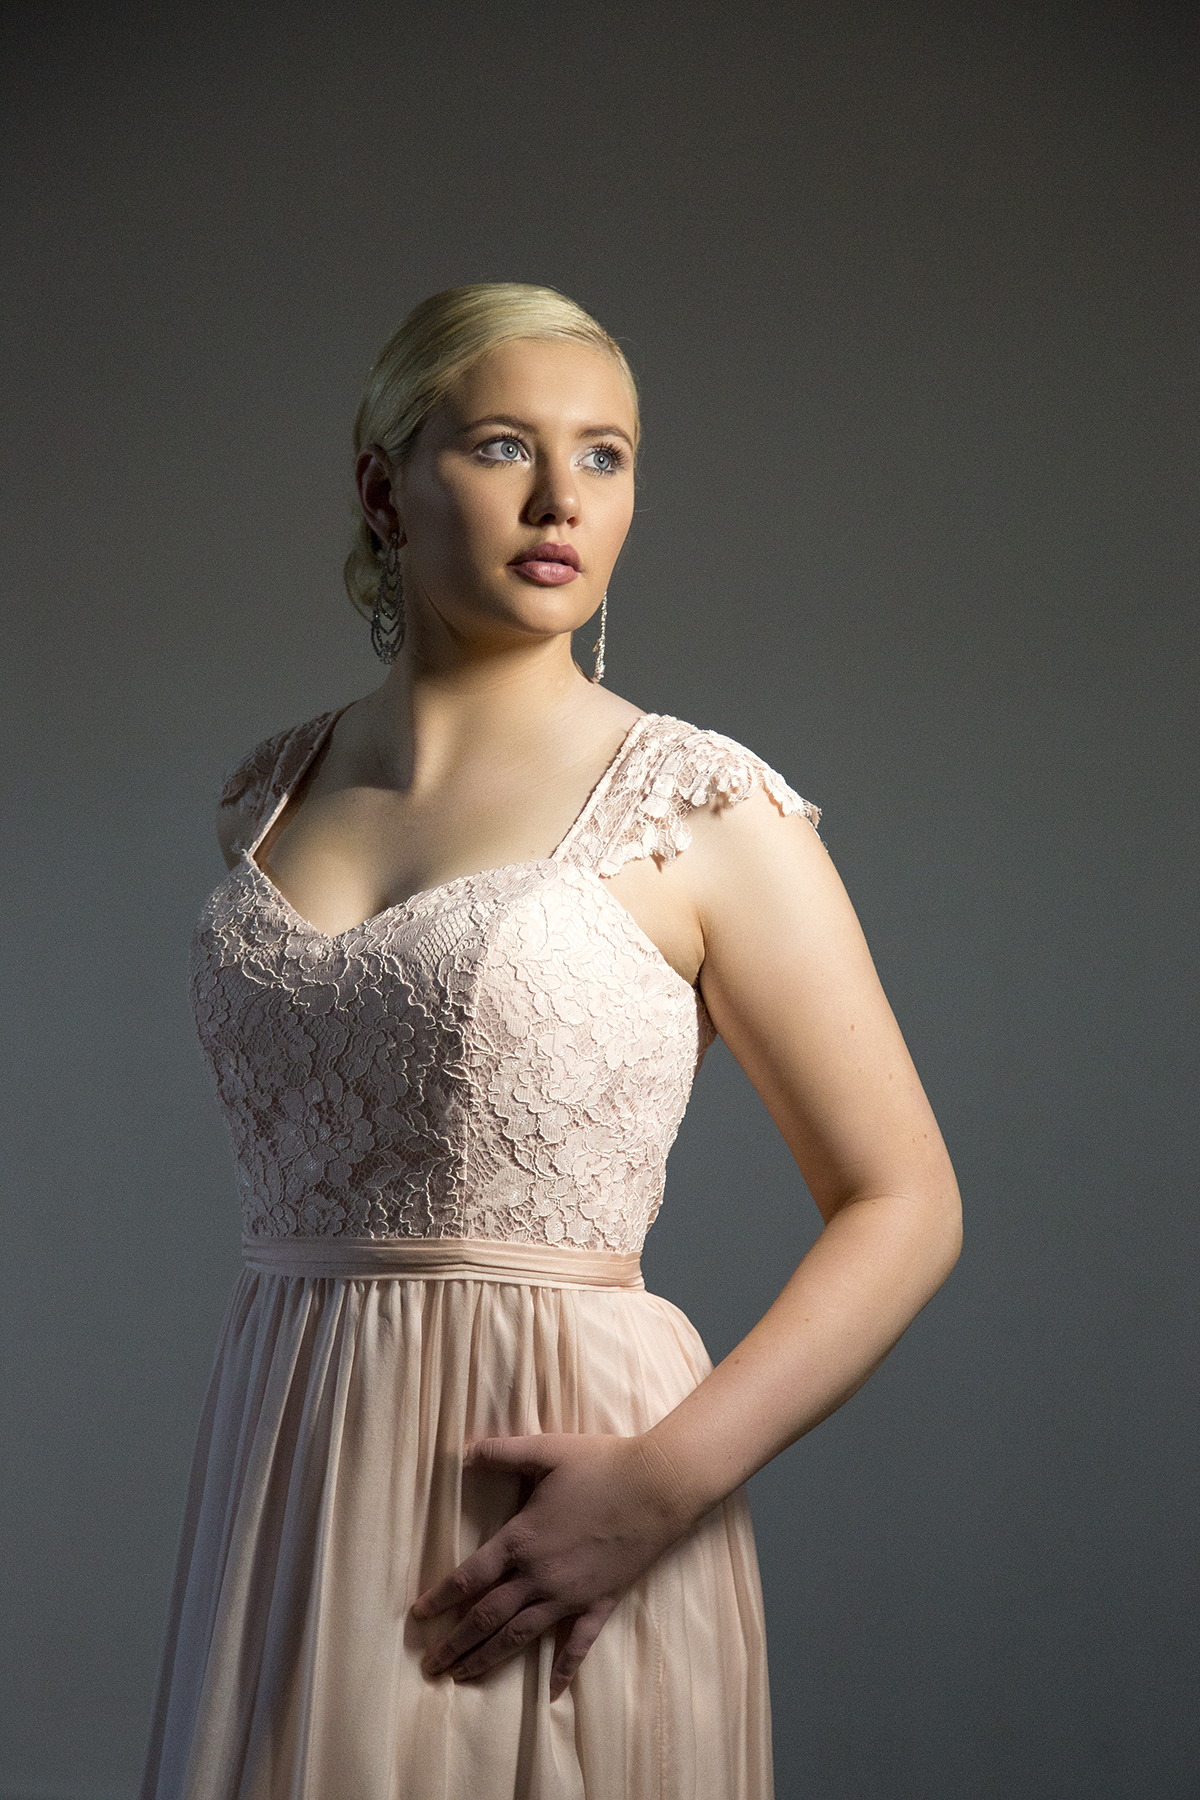 Portrait of a bride indoors